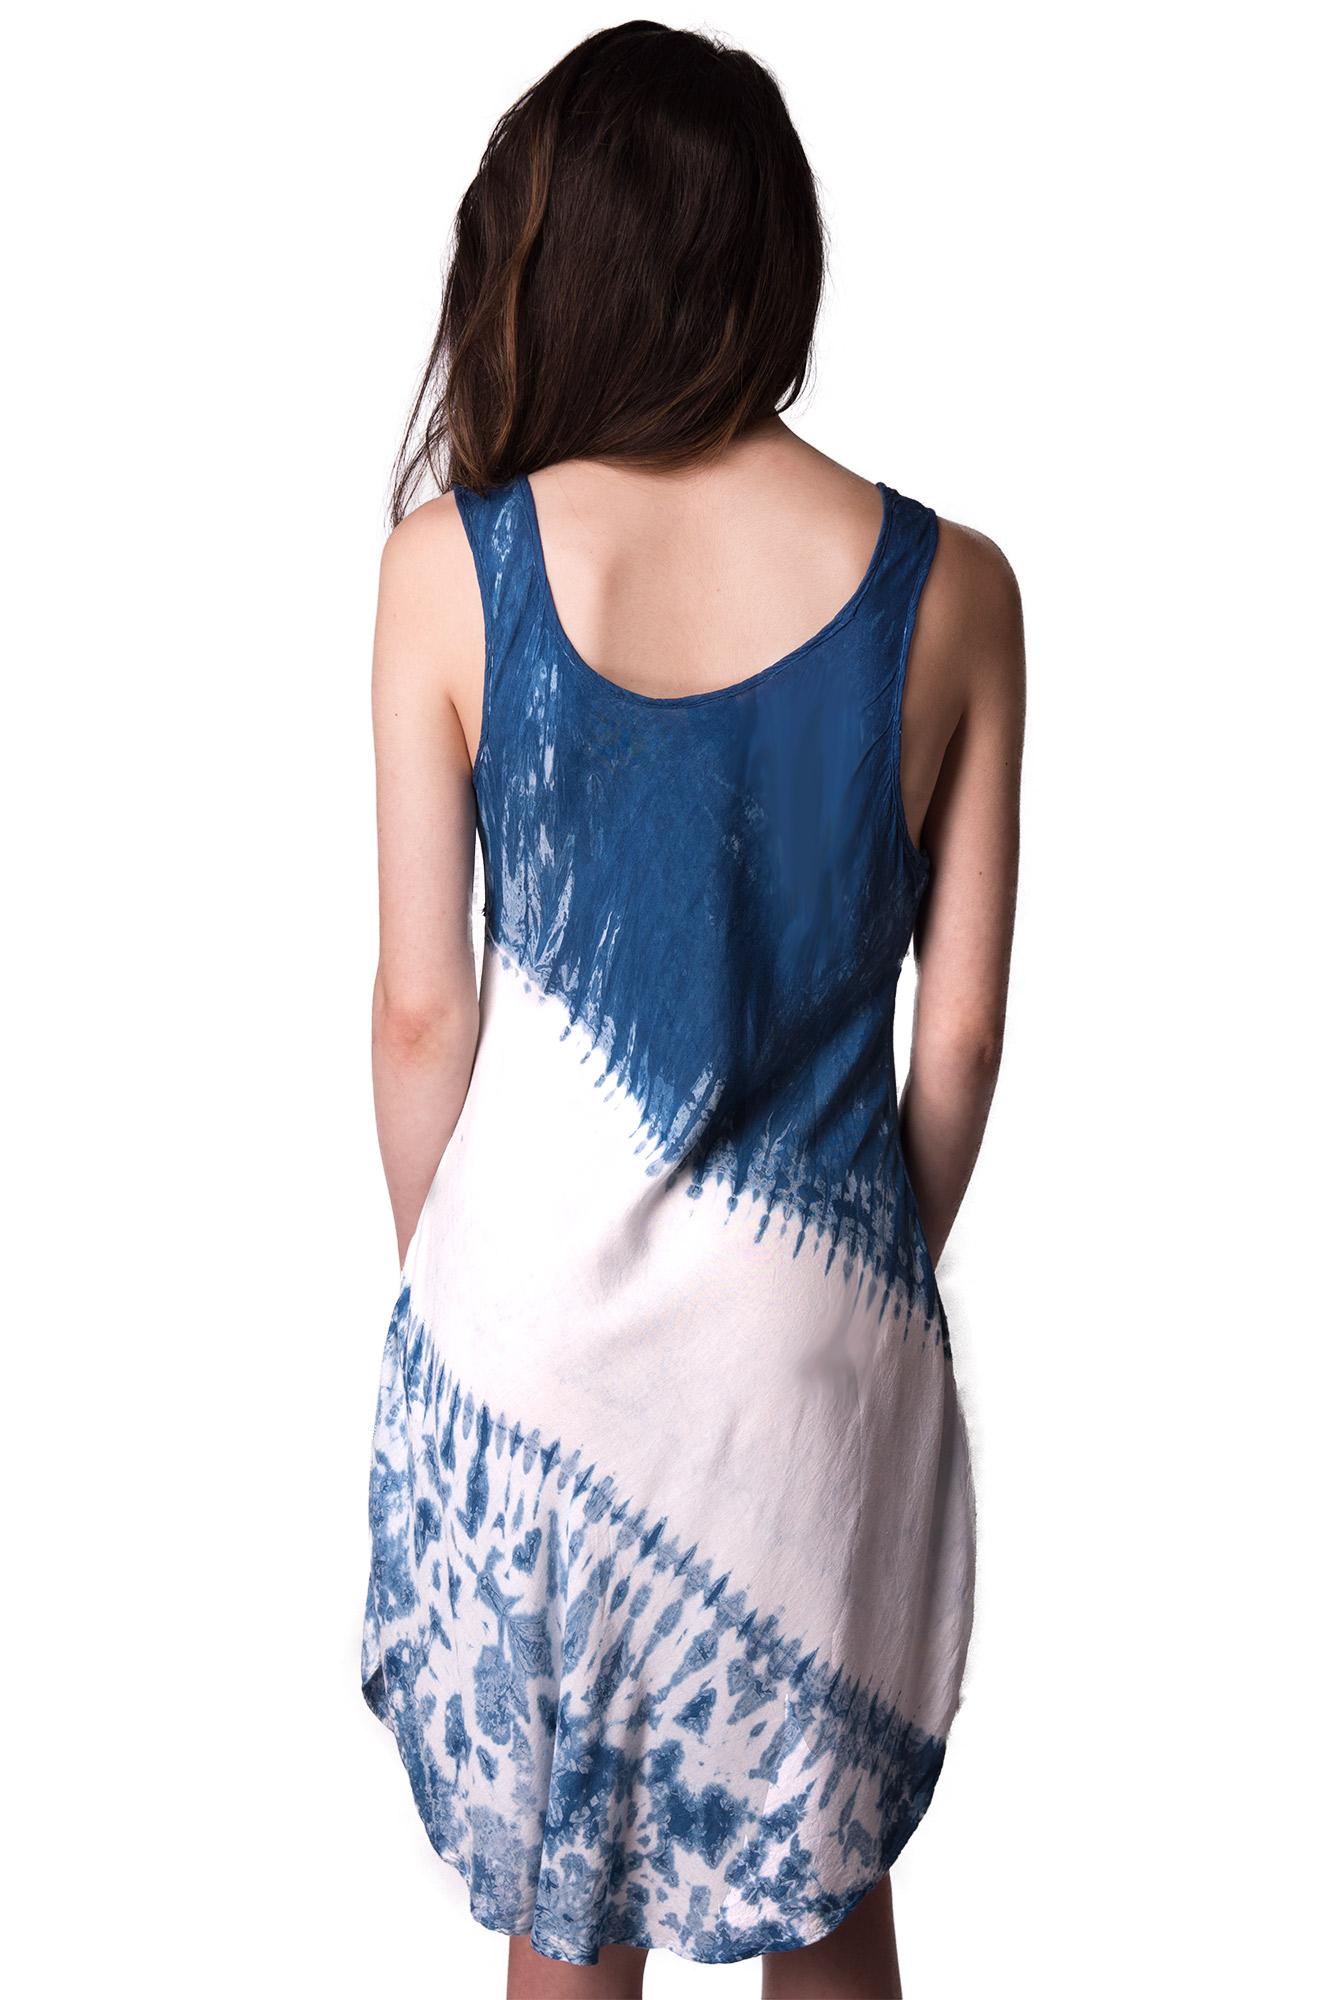 indigo short dress - 4508-IW